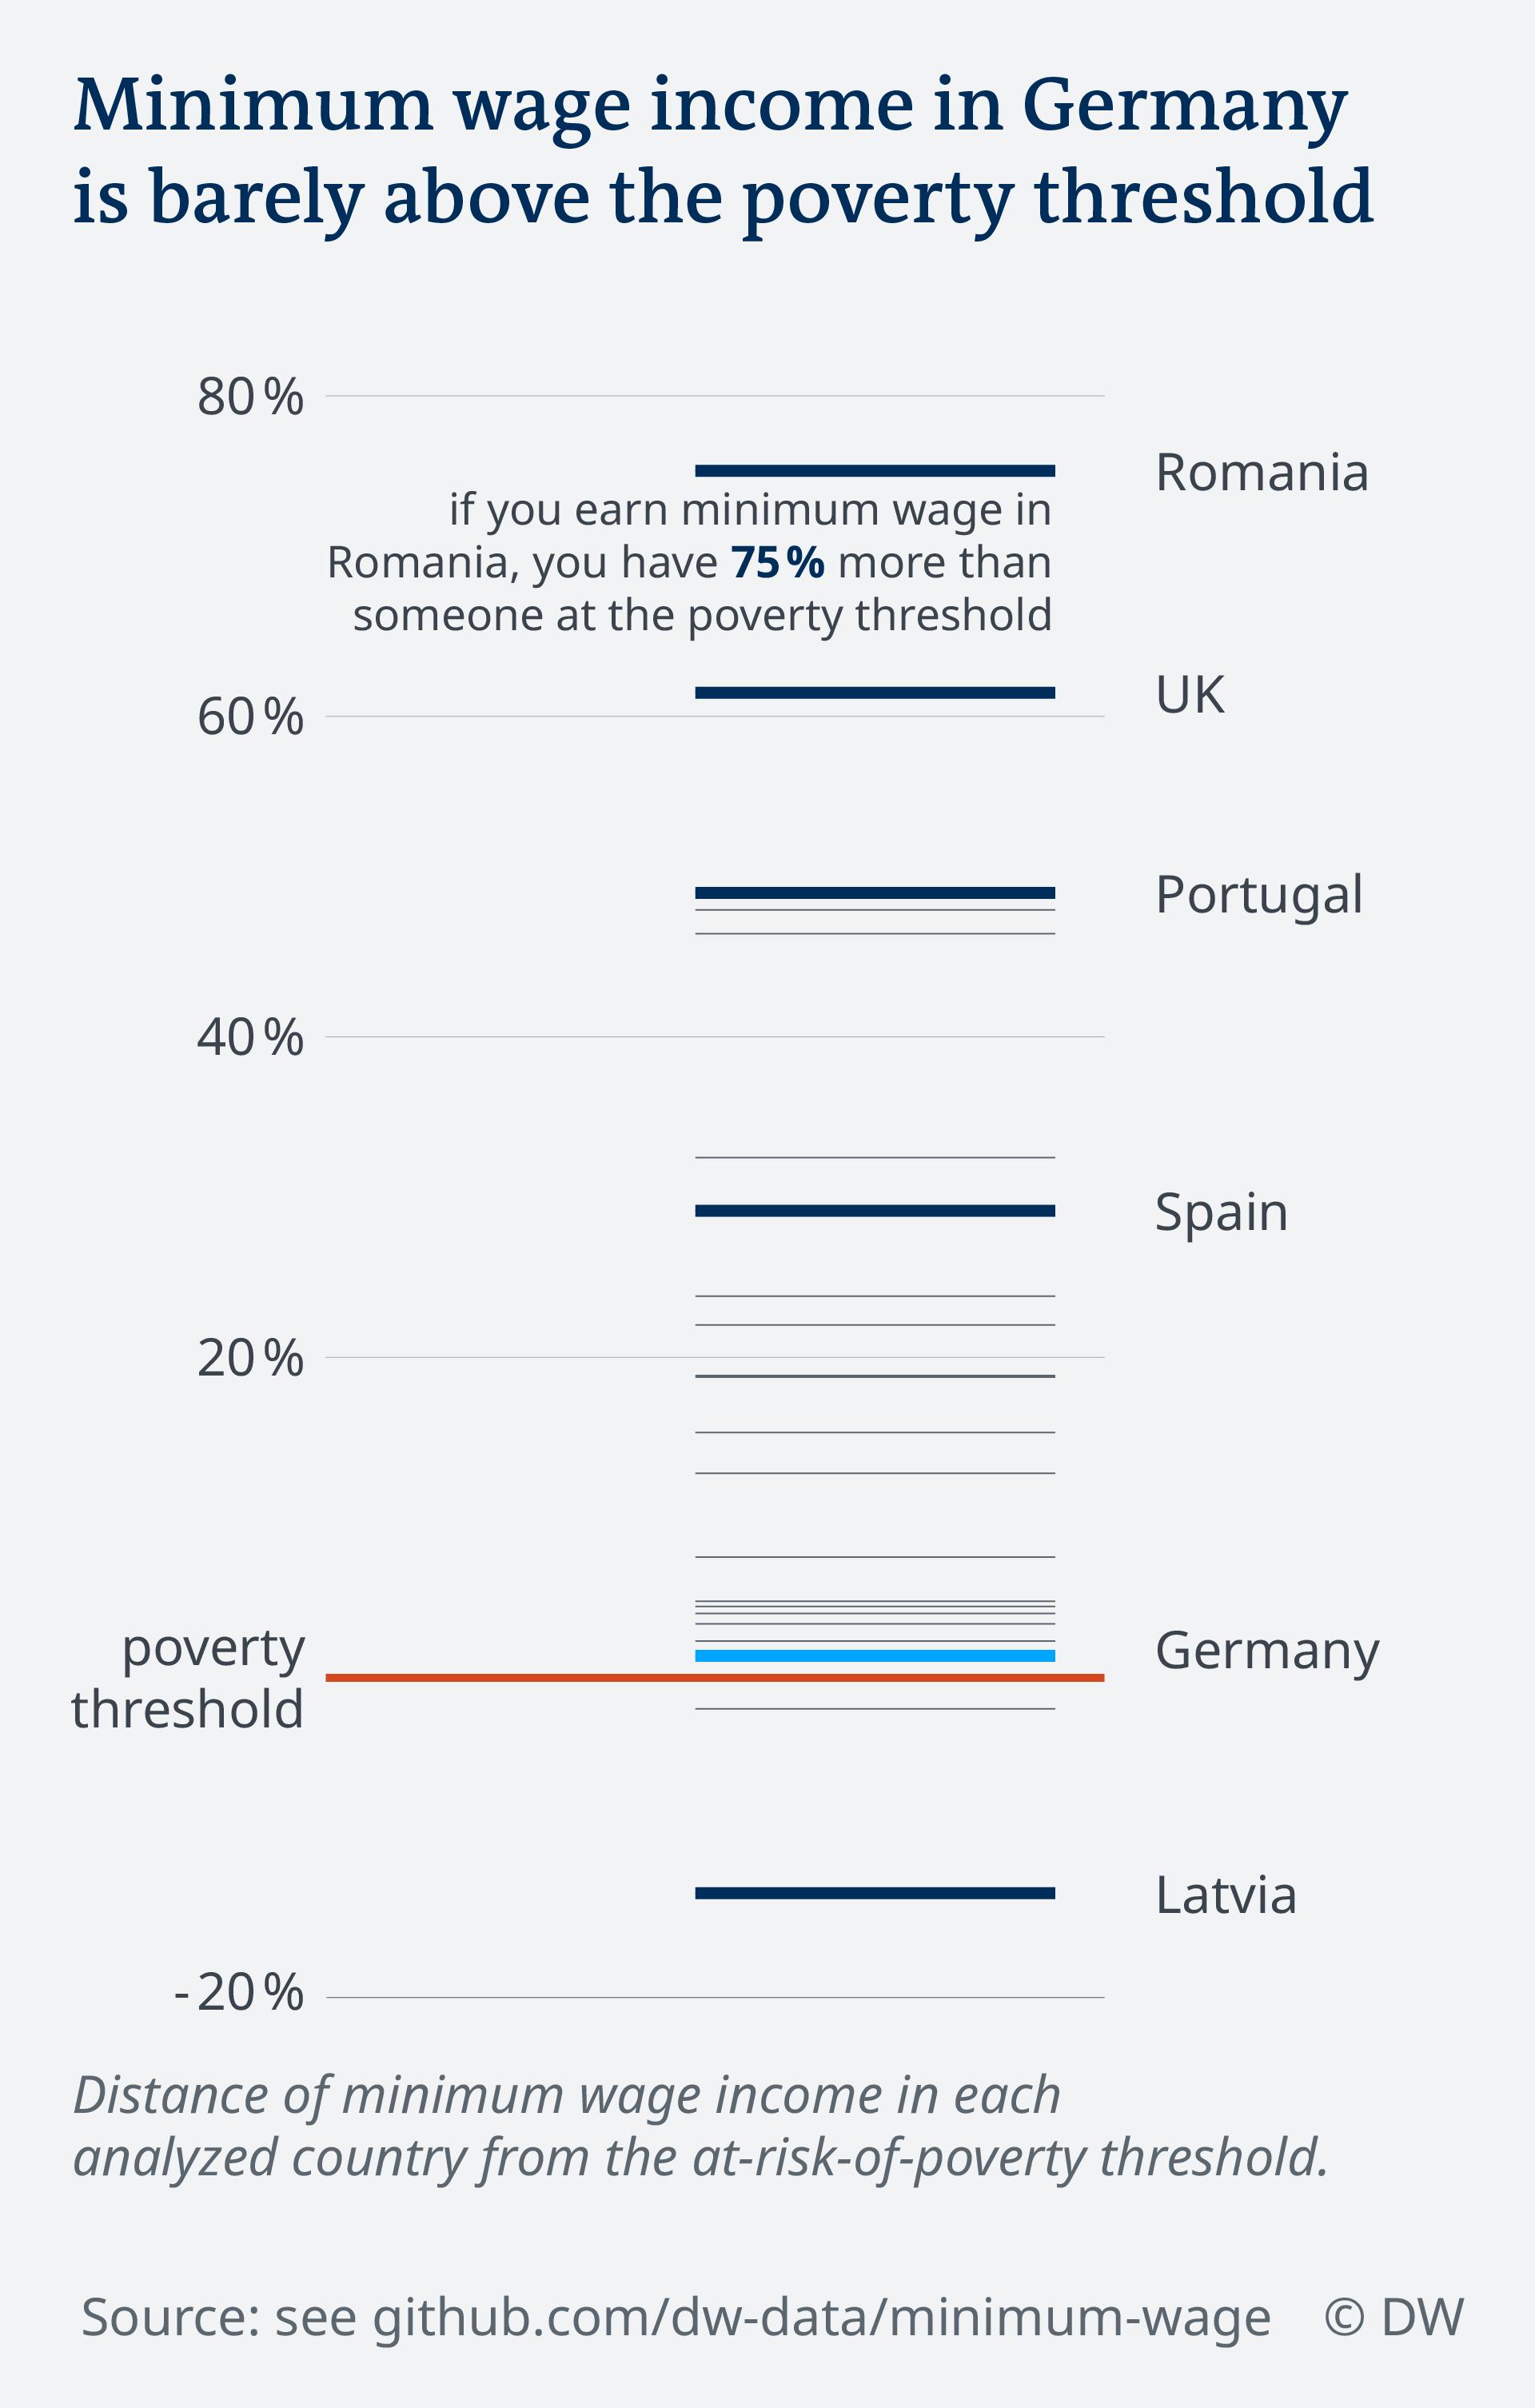 Data visualization minimum wage in Europe vs poverty threshold